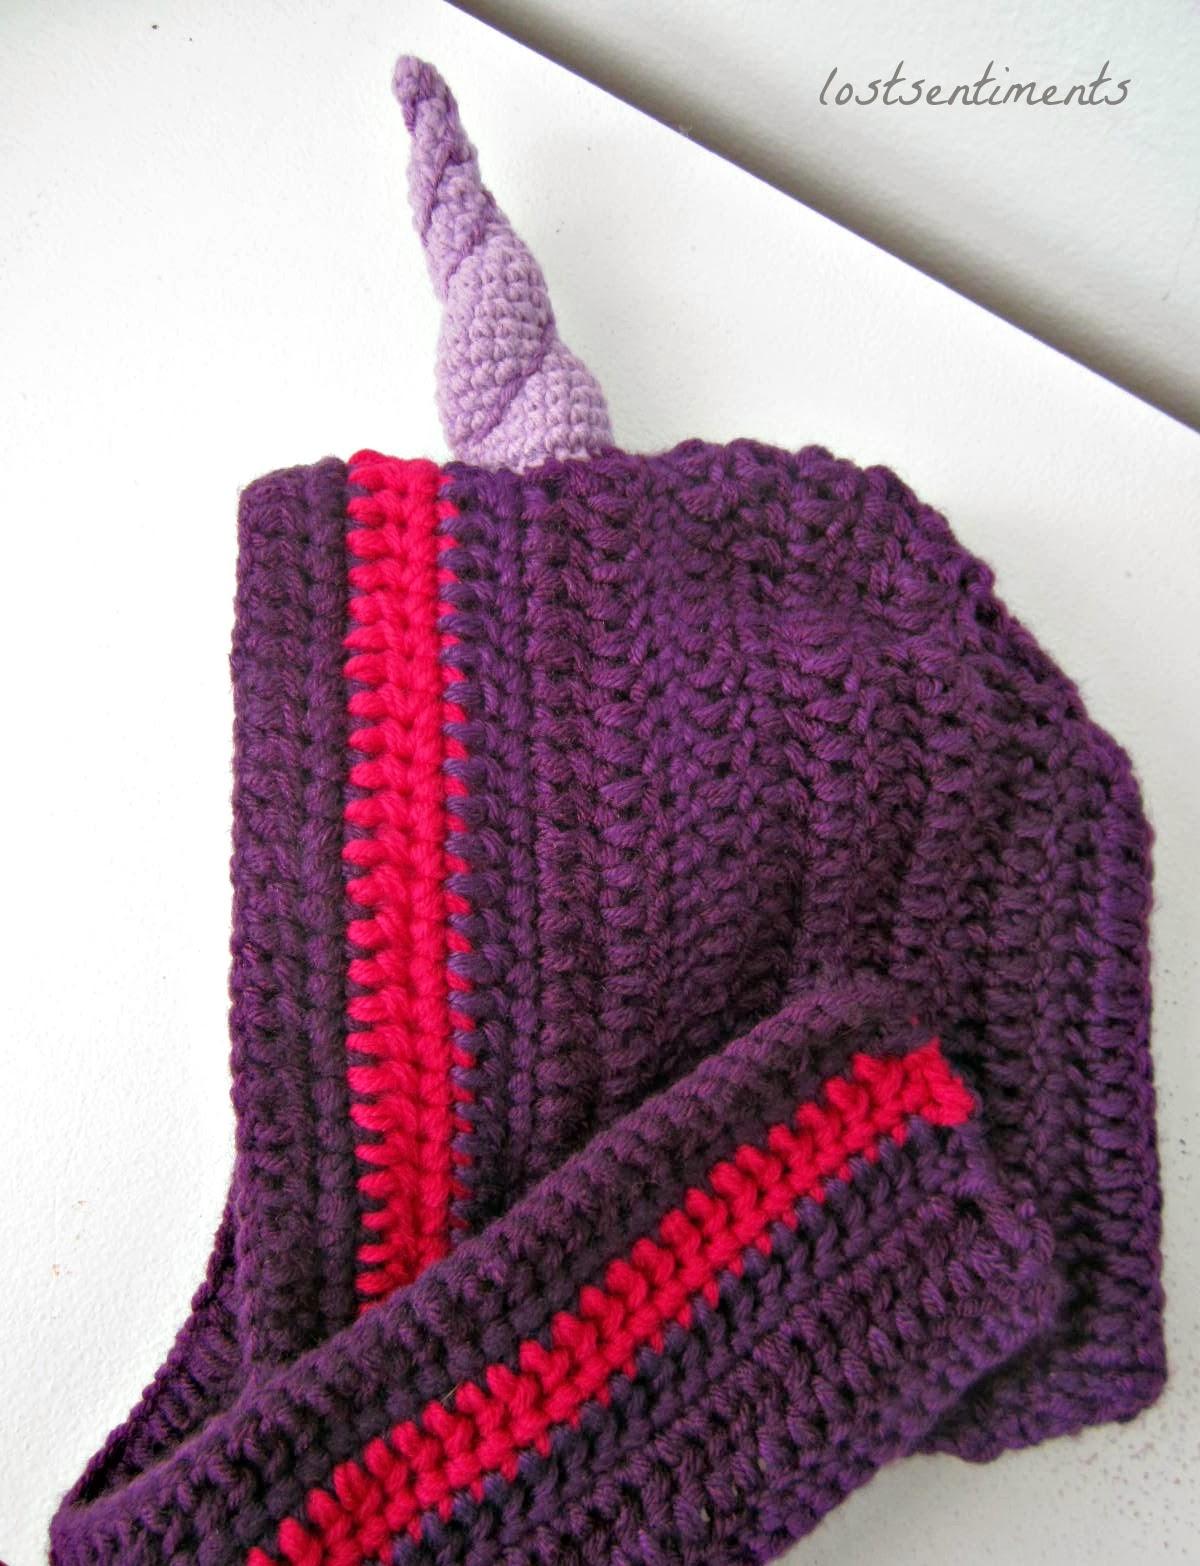 Crochet Unicorn Horn : lostsentiments: Free Amigurumi Crocheted Unicorn Horn Pattern